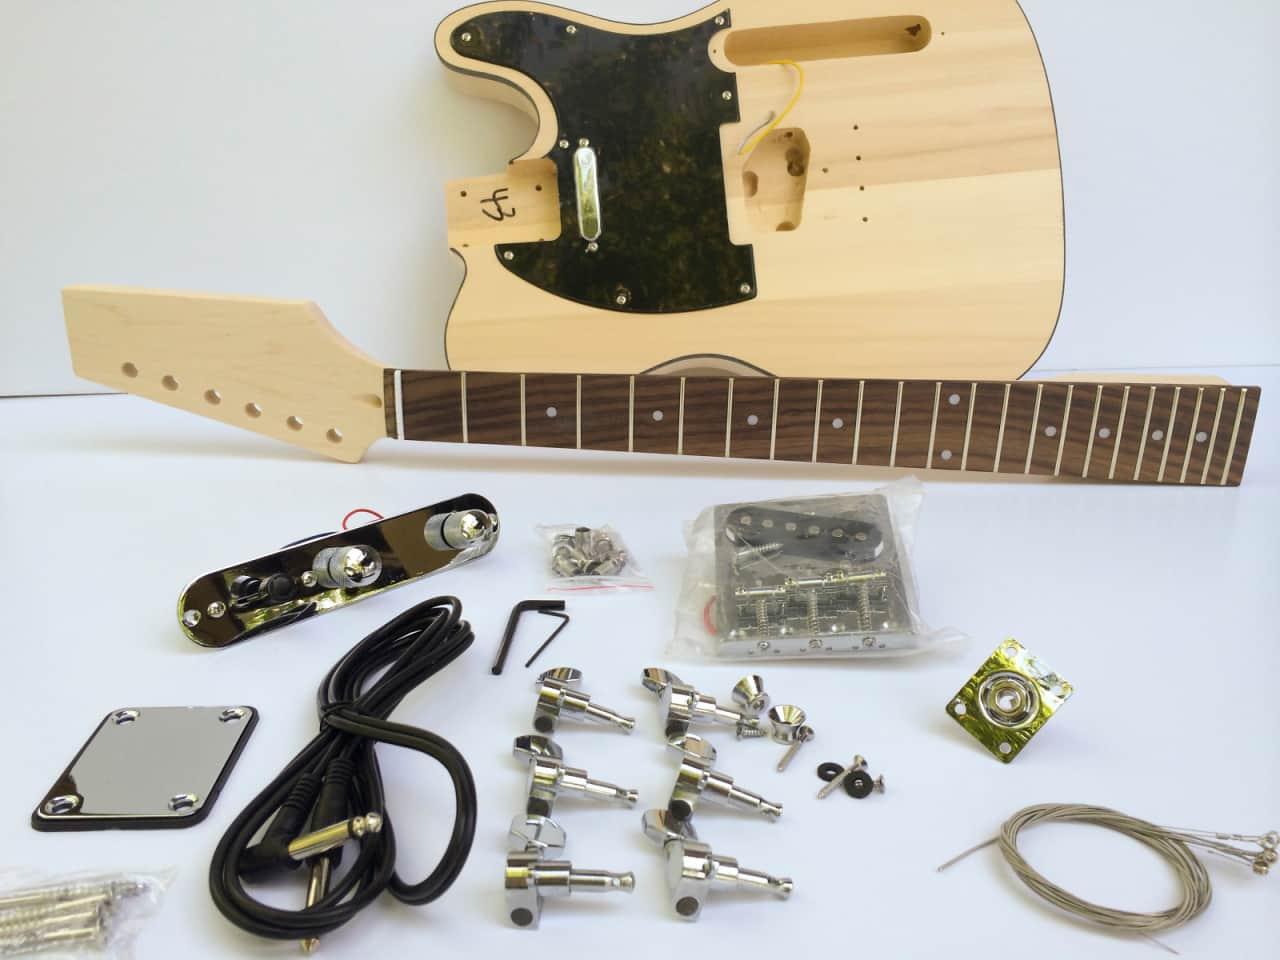 do it yourself diy electric guitar kit build your own tele reverb. Black Bedroom Furniture Sets. Home Design Ideas